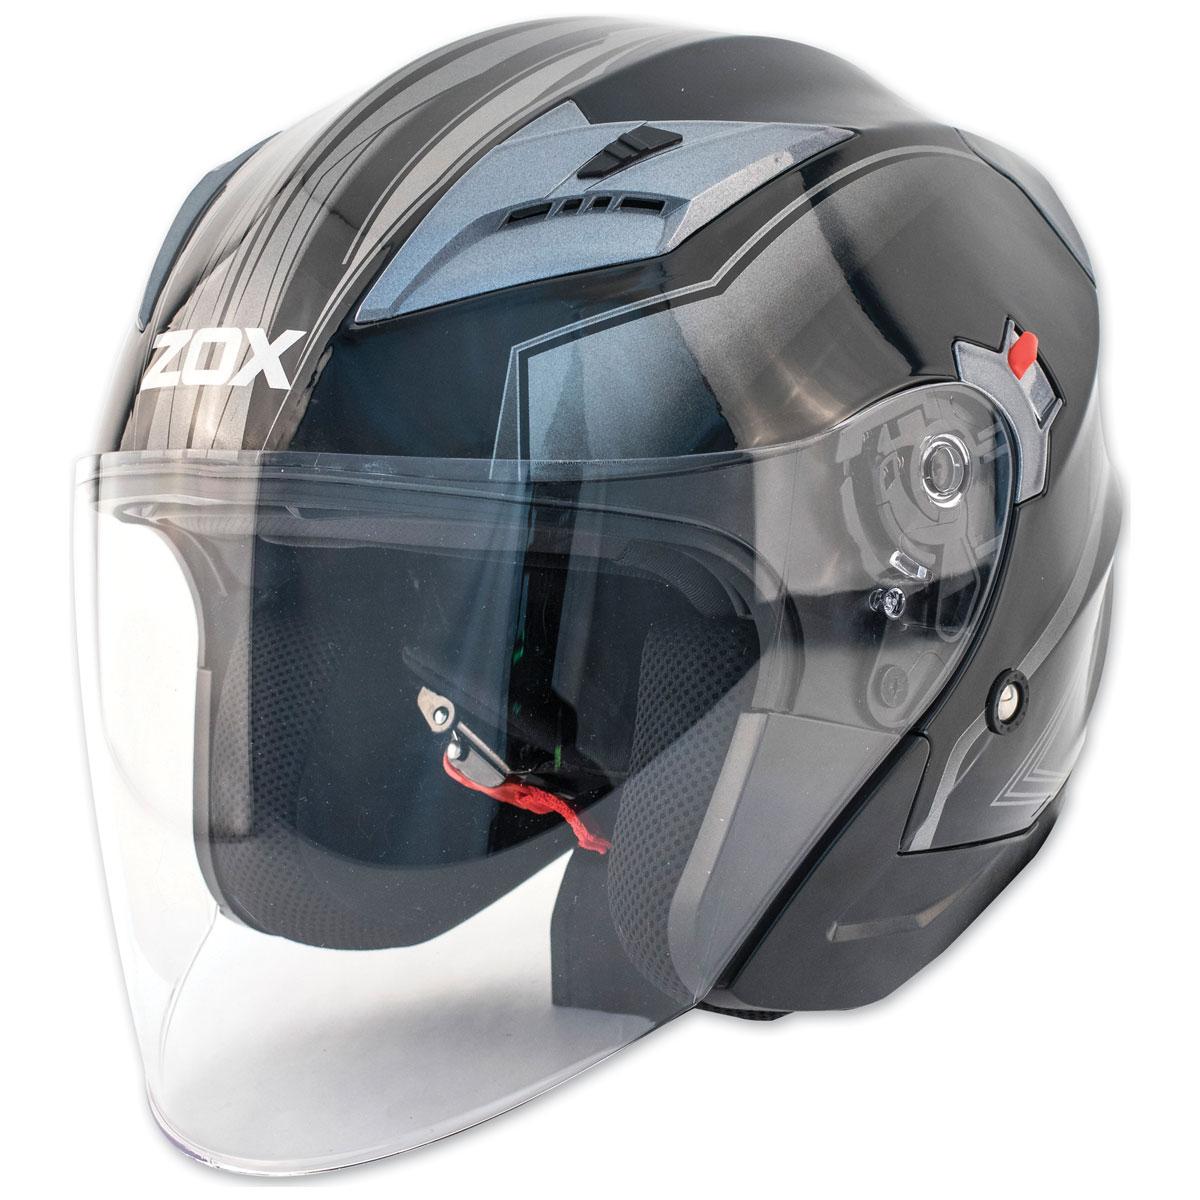 Zox Journey Trip Glossy Silver Open Face Helmet